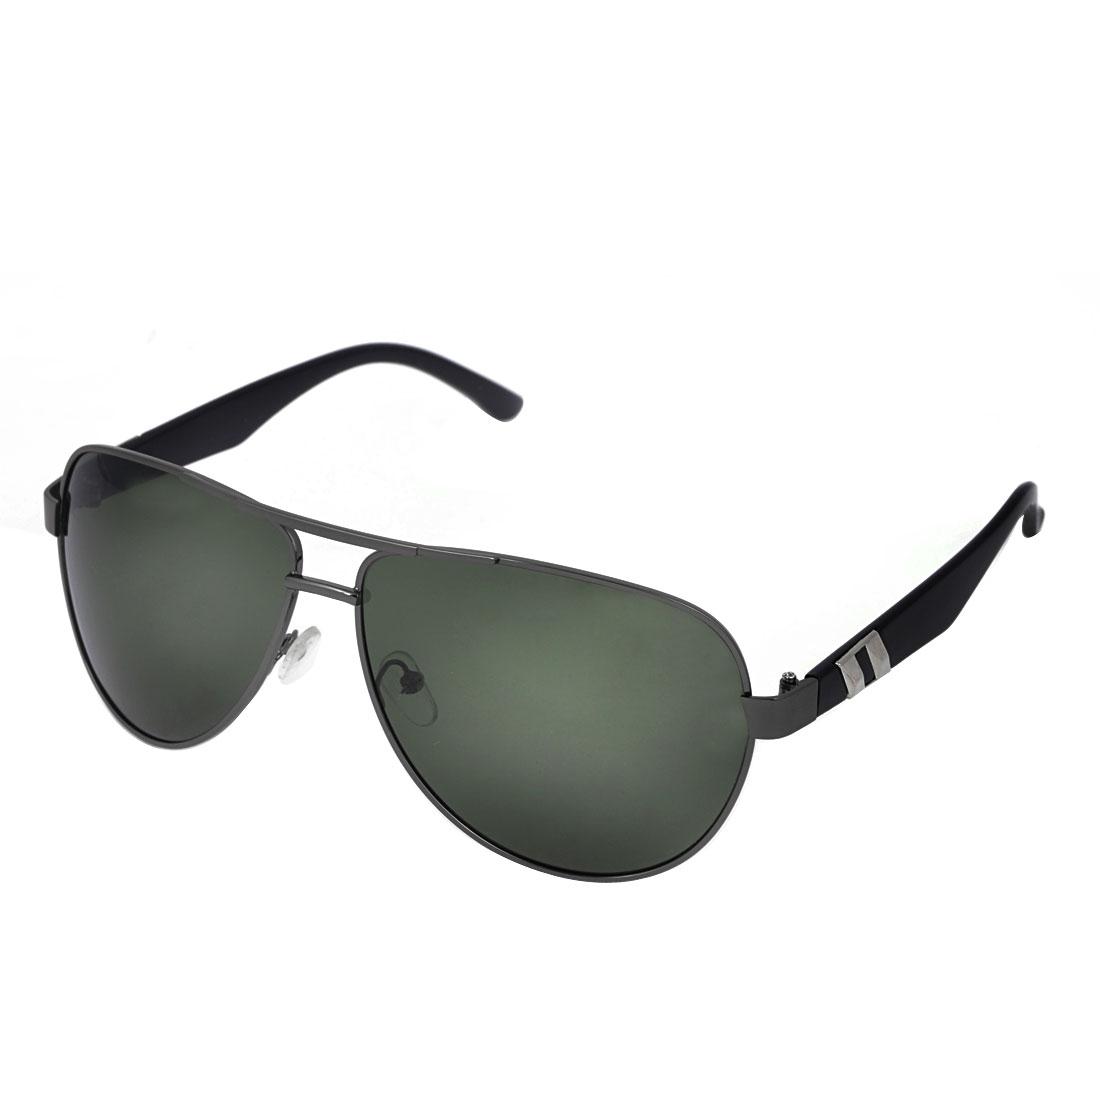 Man Black Arms Metal Frame Gray Green Waterdrop Lens Double Bridge Polarized Sunglasses